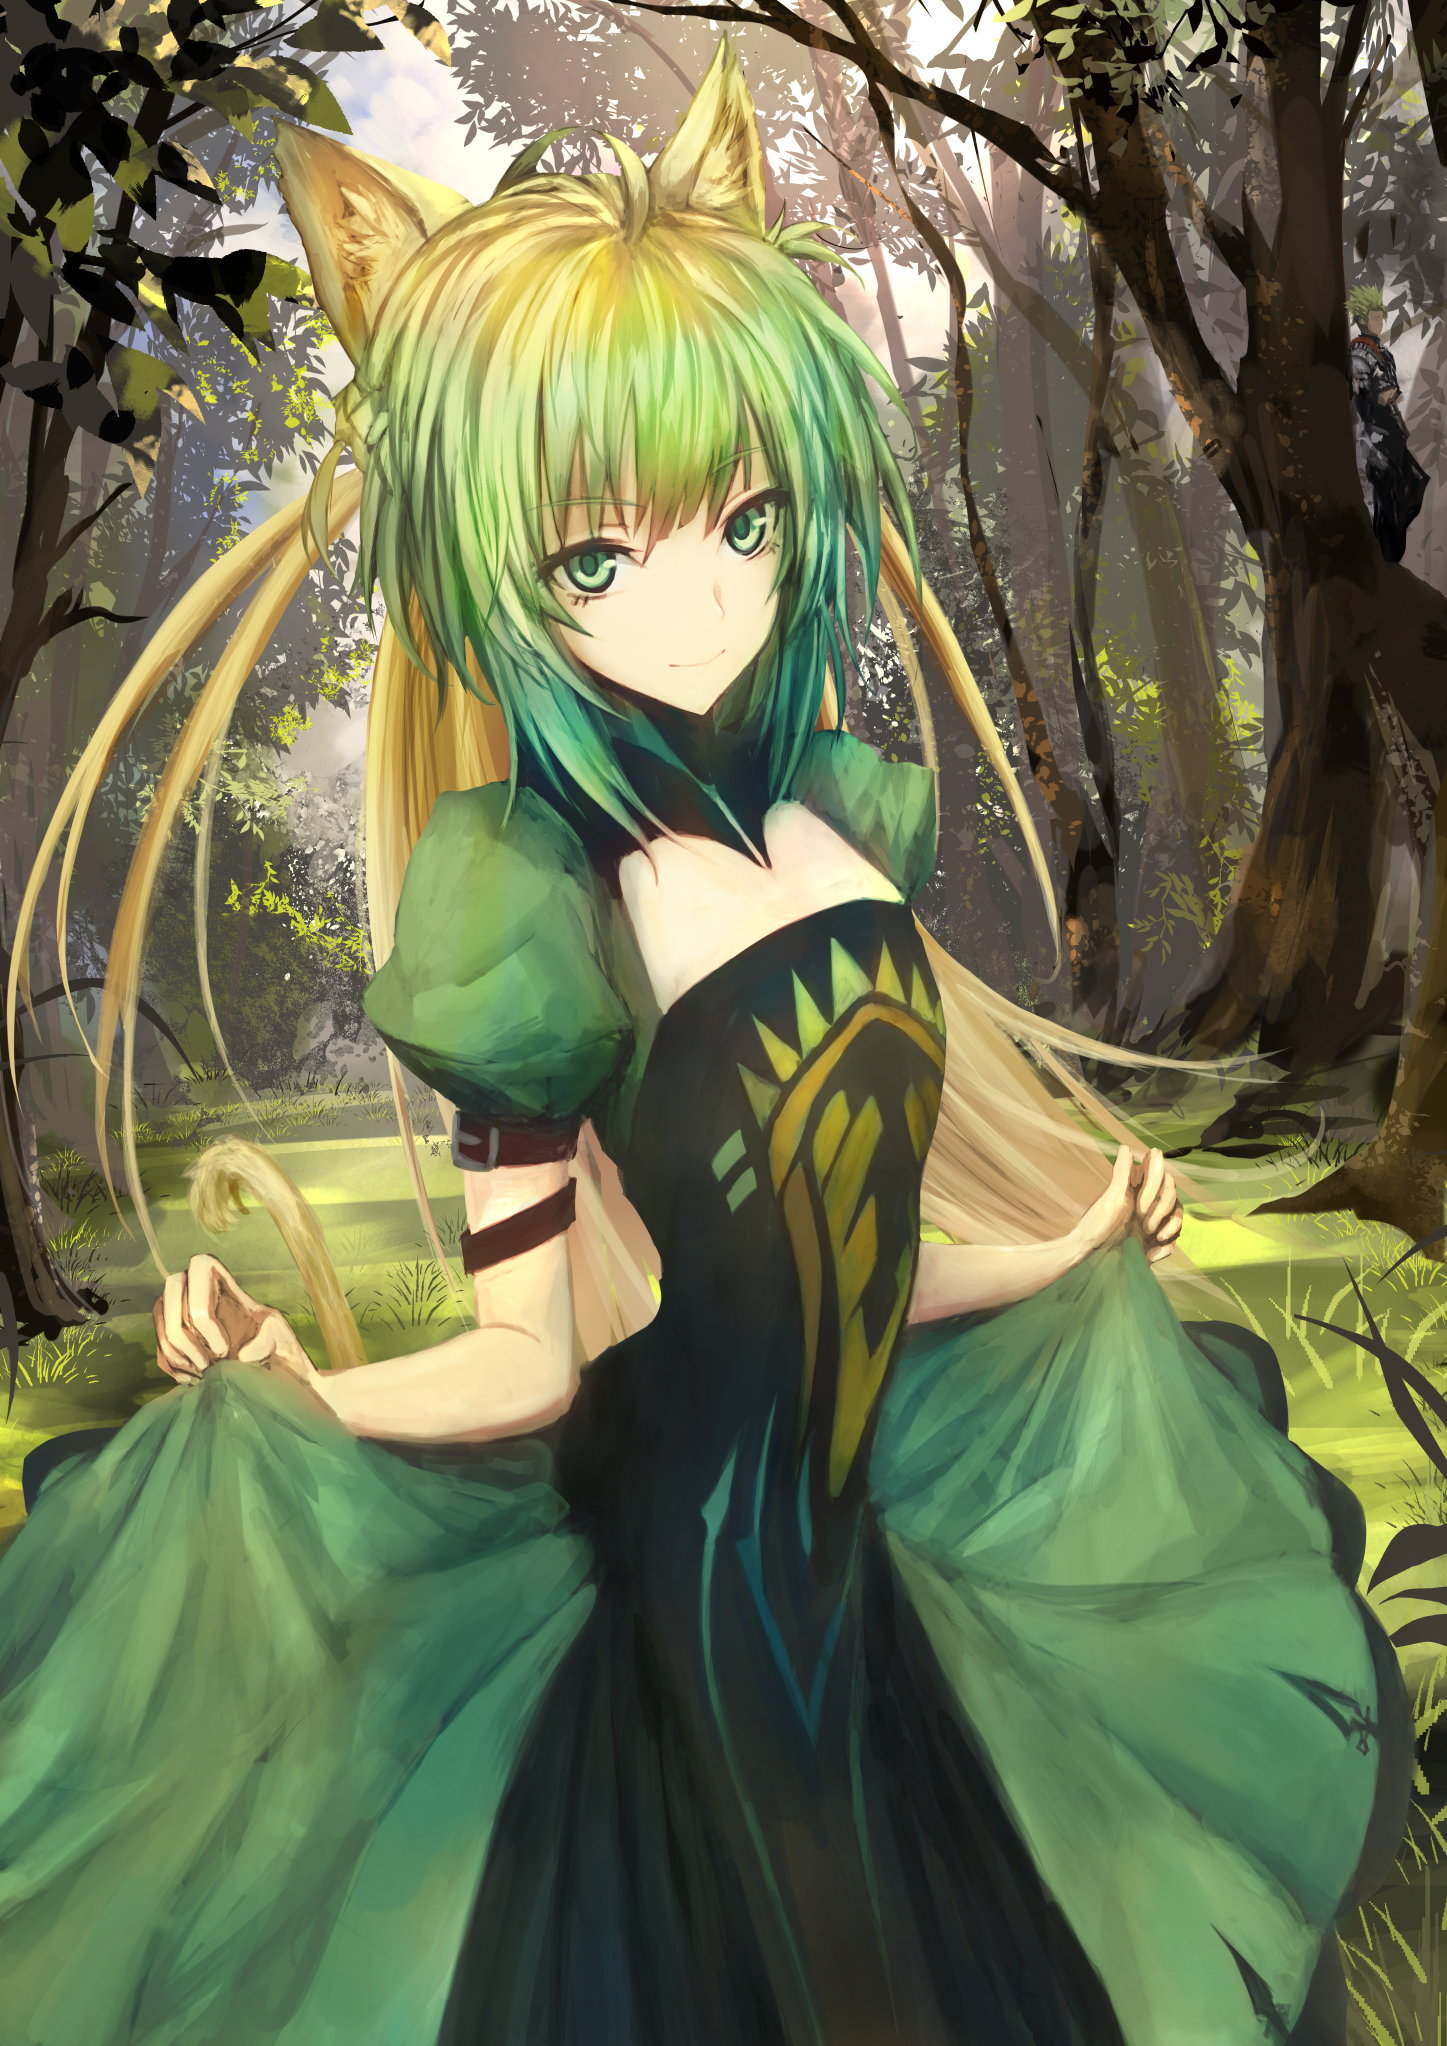 Anime 1447x2046 anime anime girls Fate/Grand Order Fate/Apocrypha  long hair green hair green eyes animal ears forest Atalanta (Fate/Grand Order)